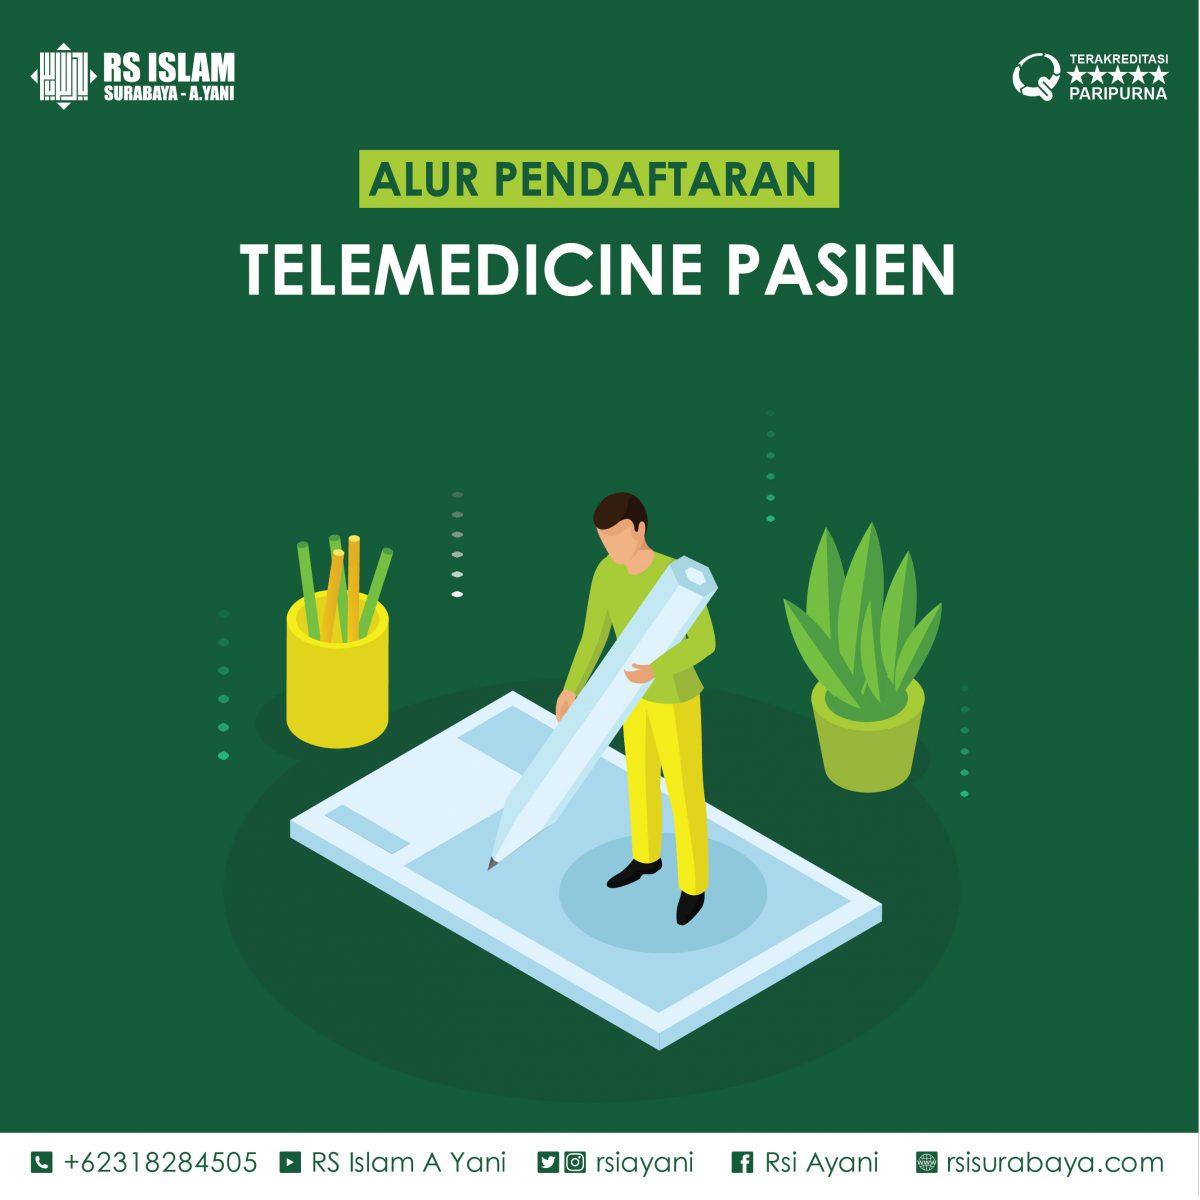 alur-telemedicien-01-1200x1200.jpg